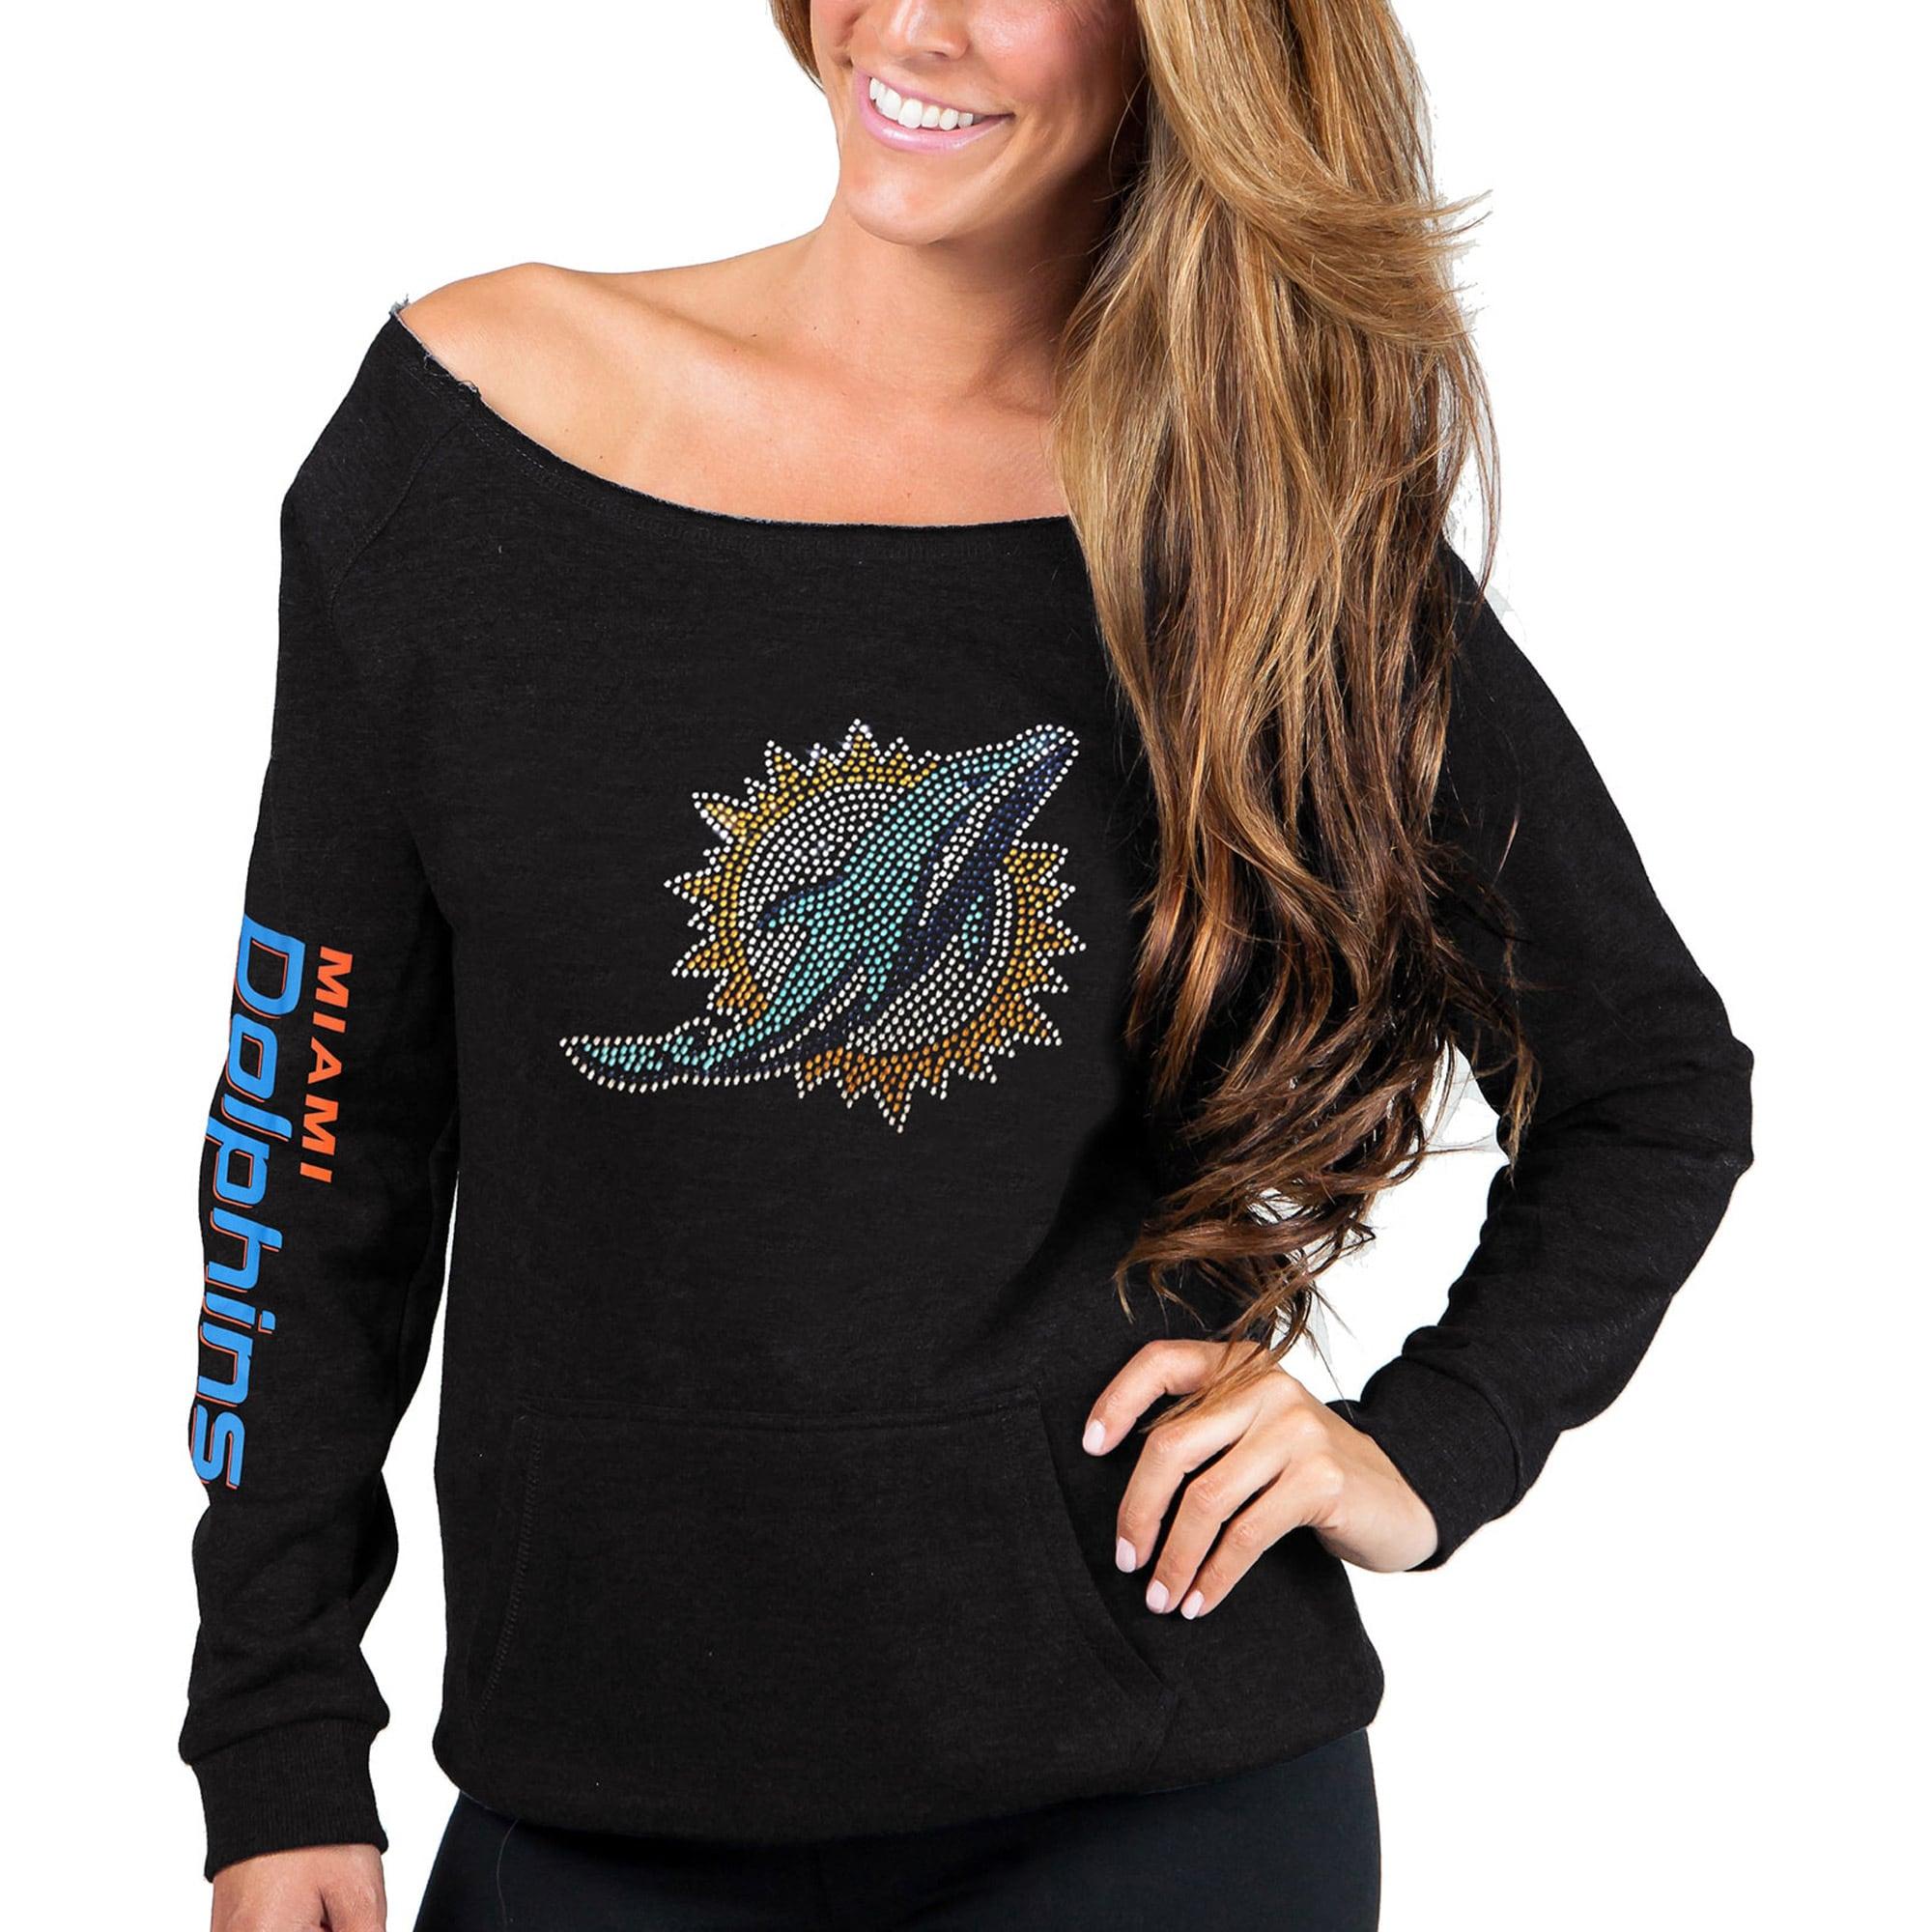 Miami Dolphins Cuce Women's Sideliner Sweatshirt - Black